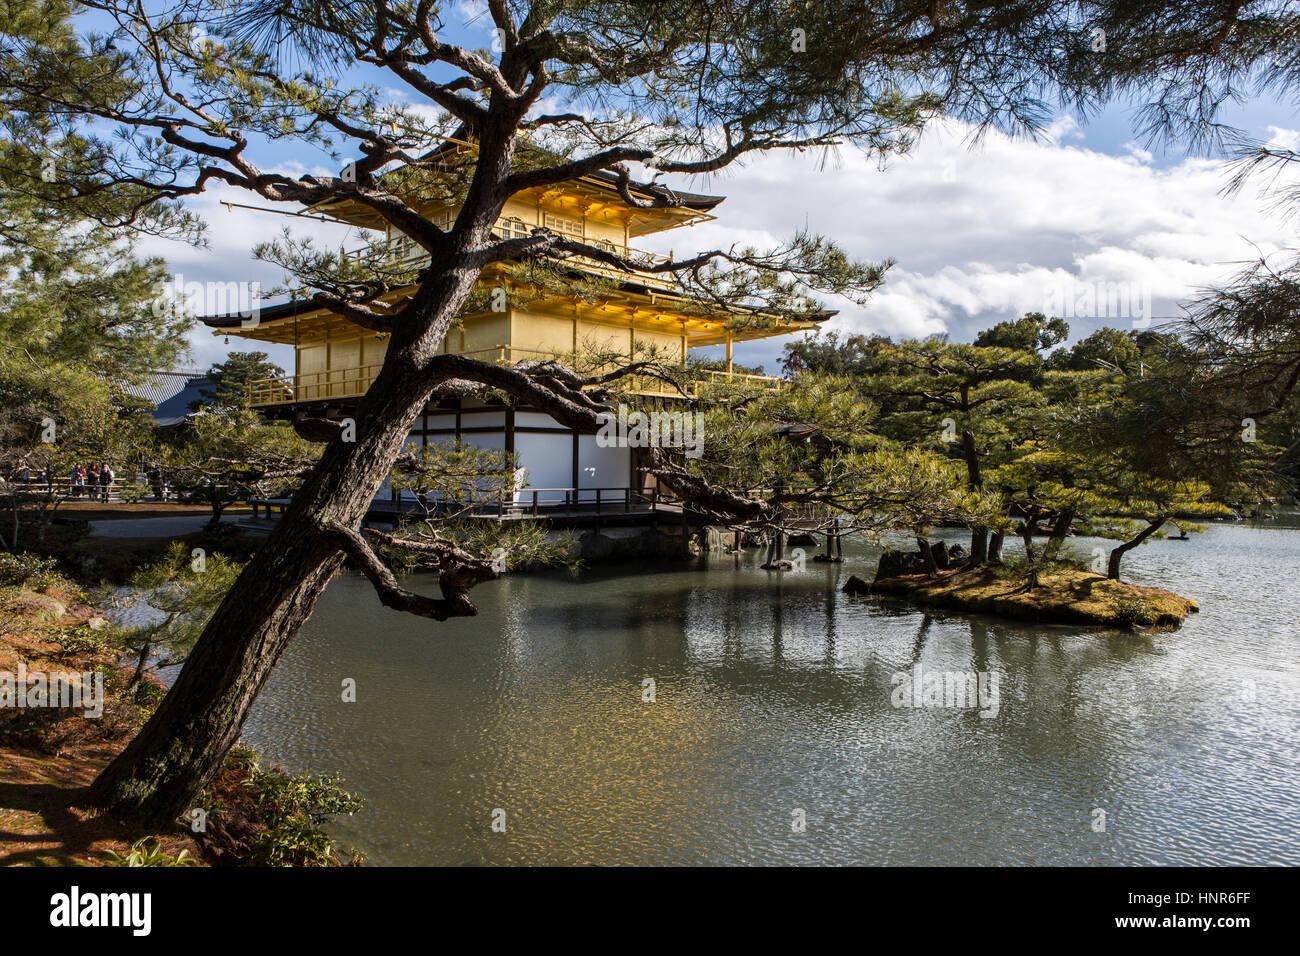 Kinkaku-ji, (金閣寺, Golden Pavilion) officially named Rokuon-ji, is a Zen Buddhist temple in Kyoto, Japan Stock Photo